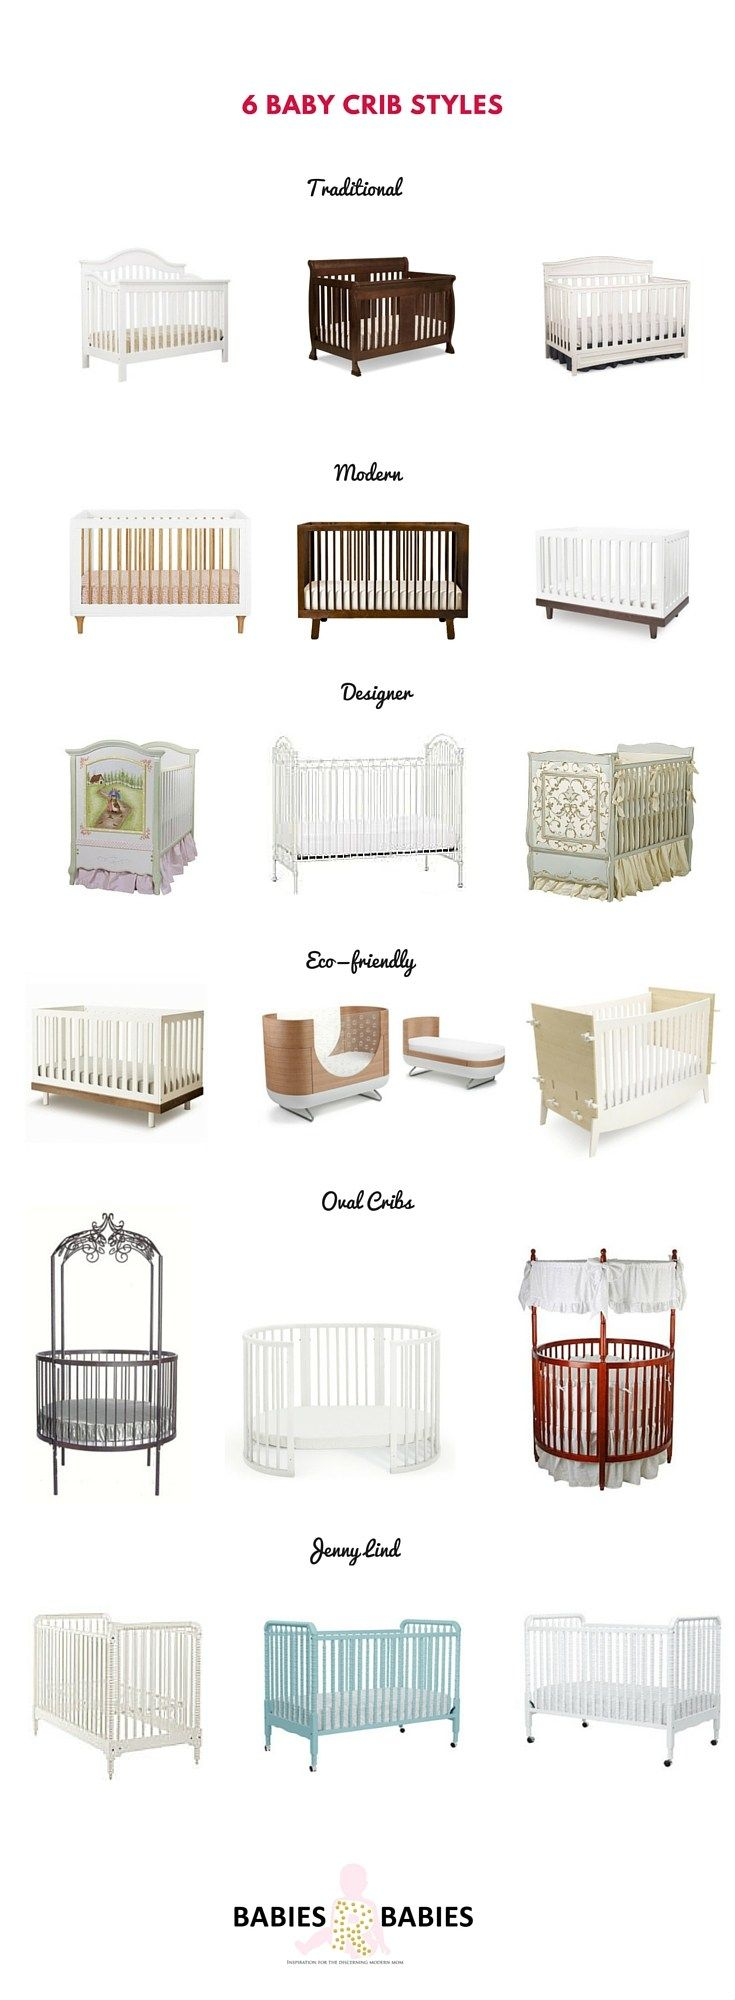 6 baby crib styles